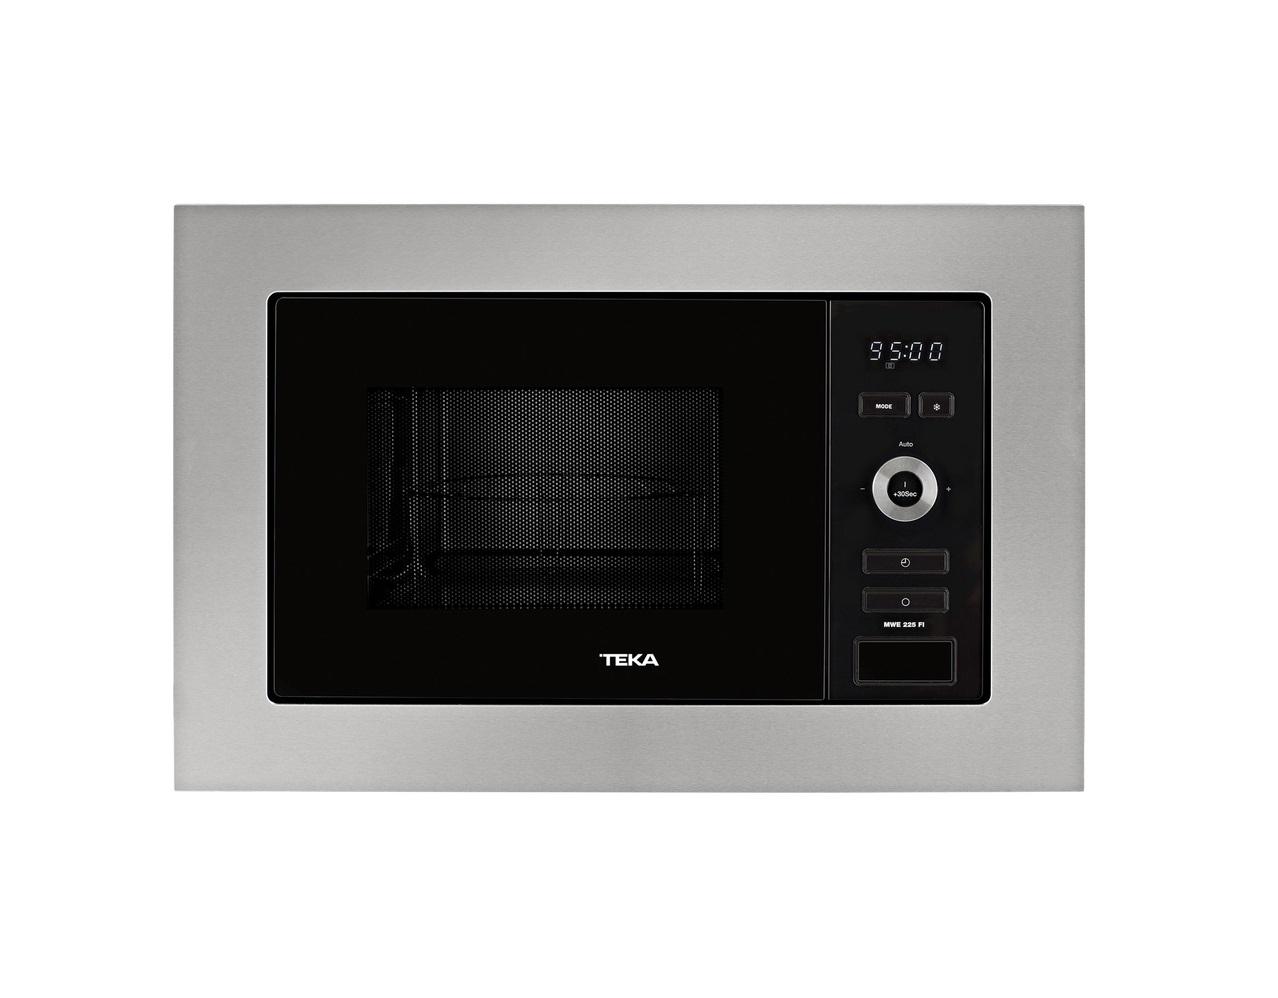 Cuptor cu microunde incorporabil Teka MWE 225 FI 20 litri grill 800W inox poza